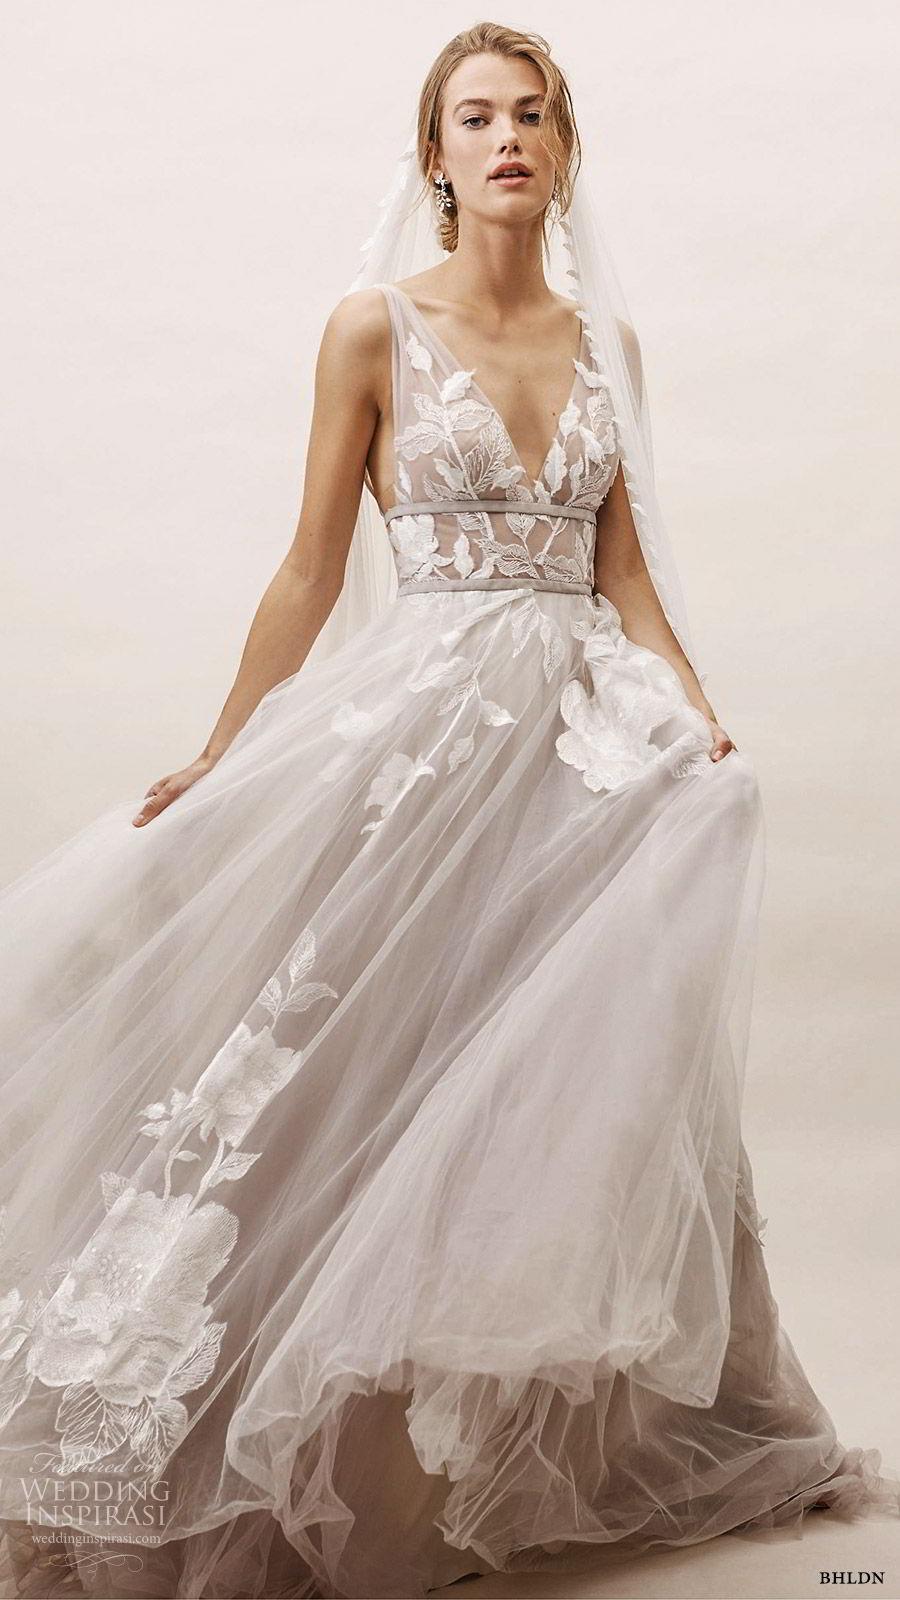 bhldn spring 2019 bridal sleeveless thick straps v neckline embellished bodice a line ball gown wedding dress sweep train silver color low vback romantic (18) mv